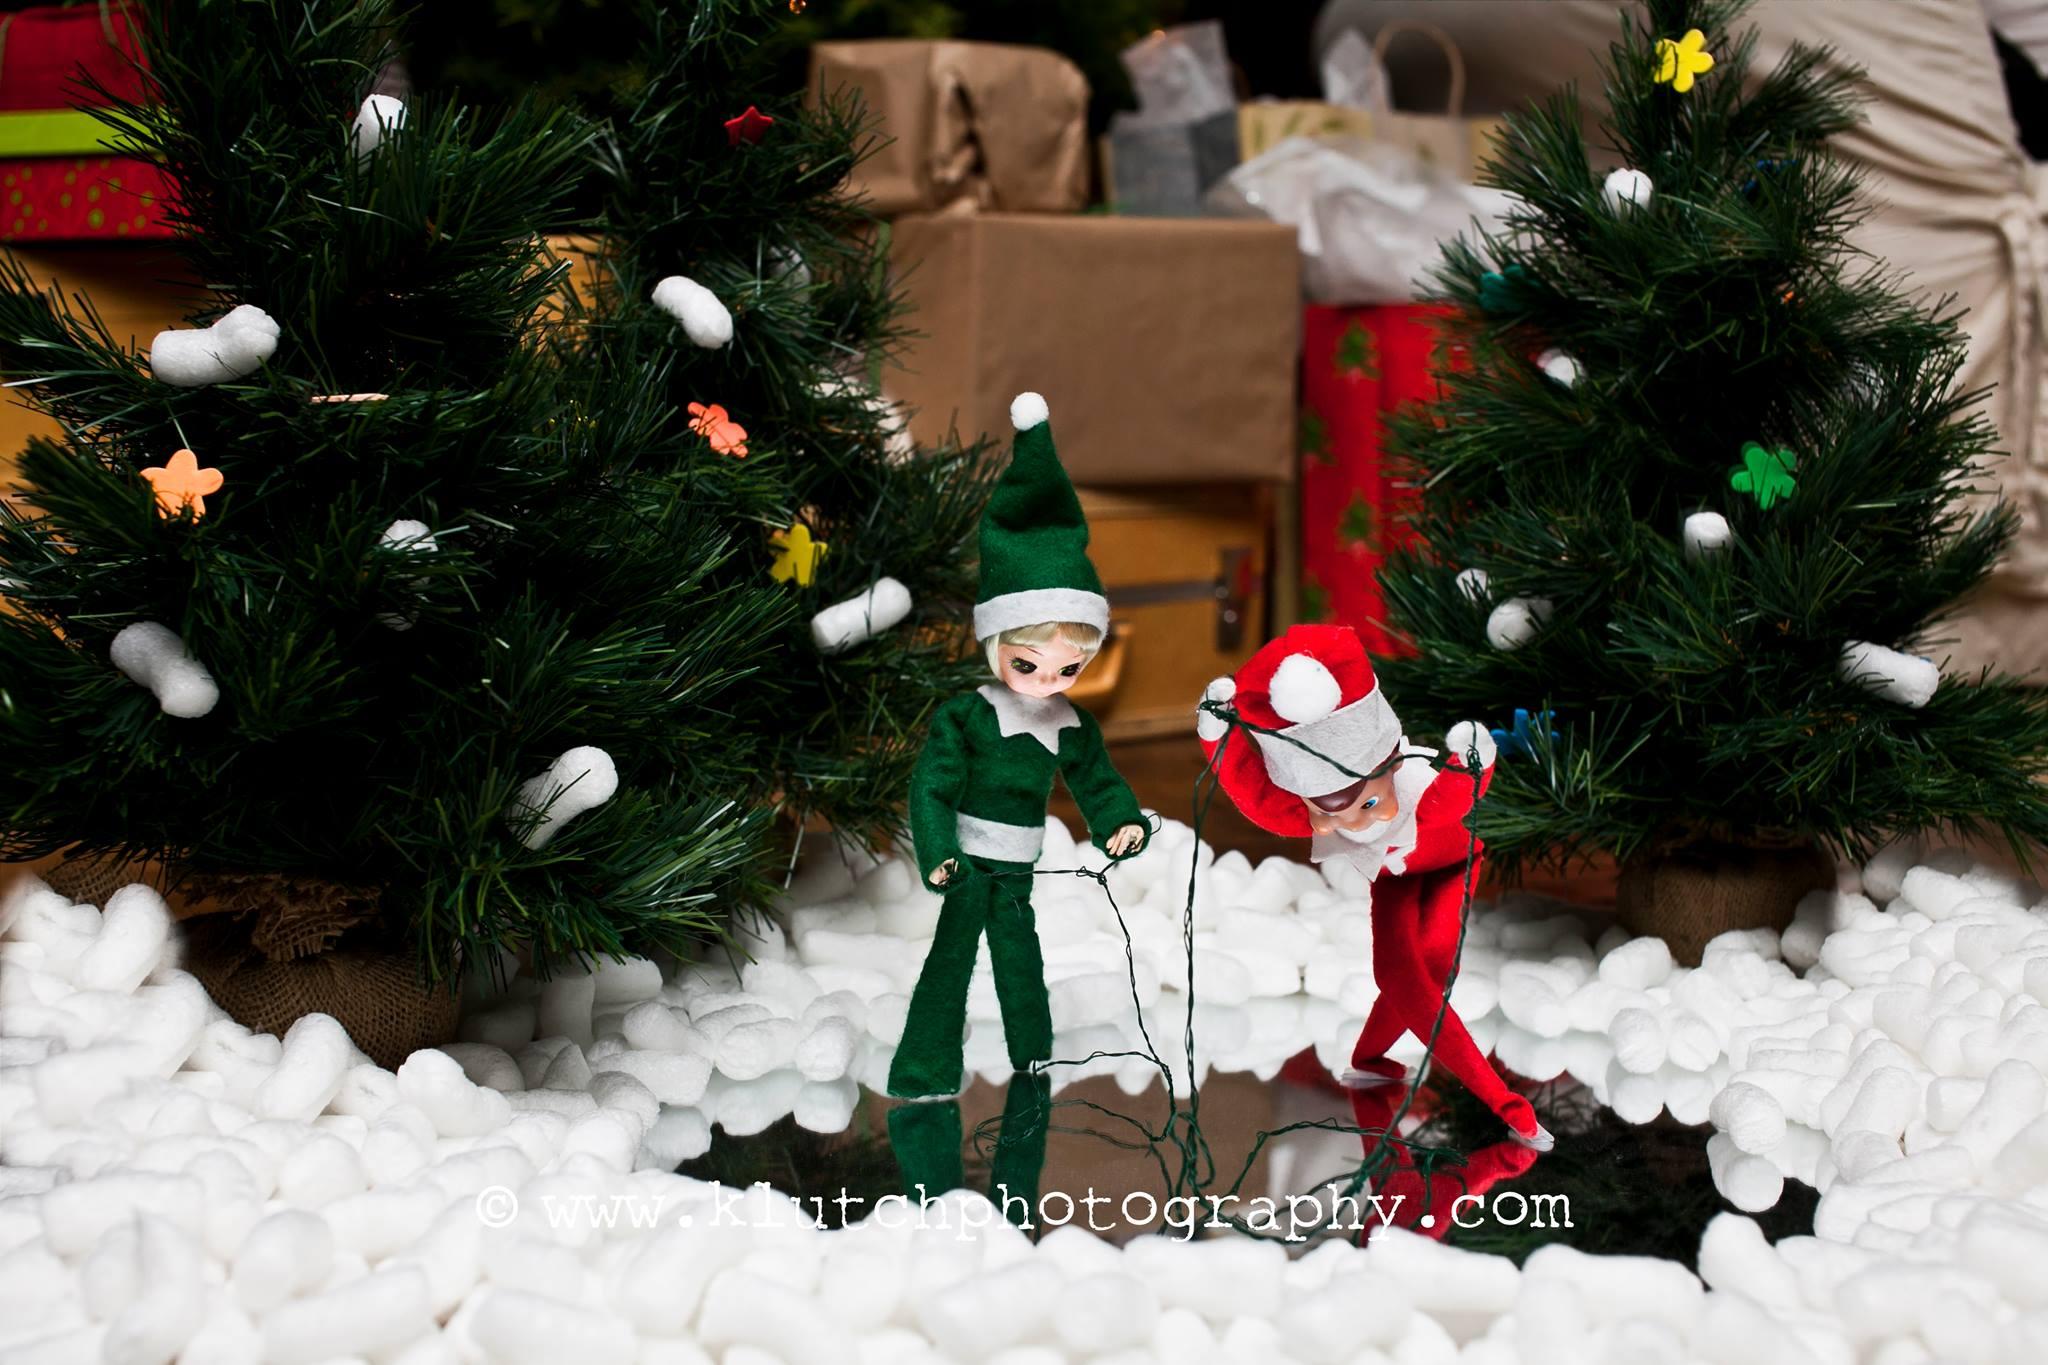 Klutch Photography, family photographer, elf on the shelf, vancouver family photographer, whiterock family photographer, lifeunscripted photographer, lifestlye photographer c.jpg